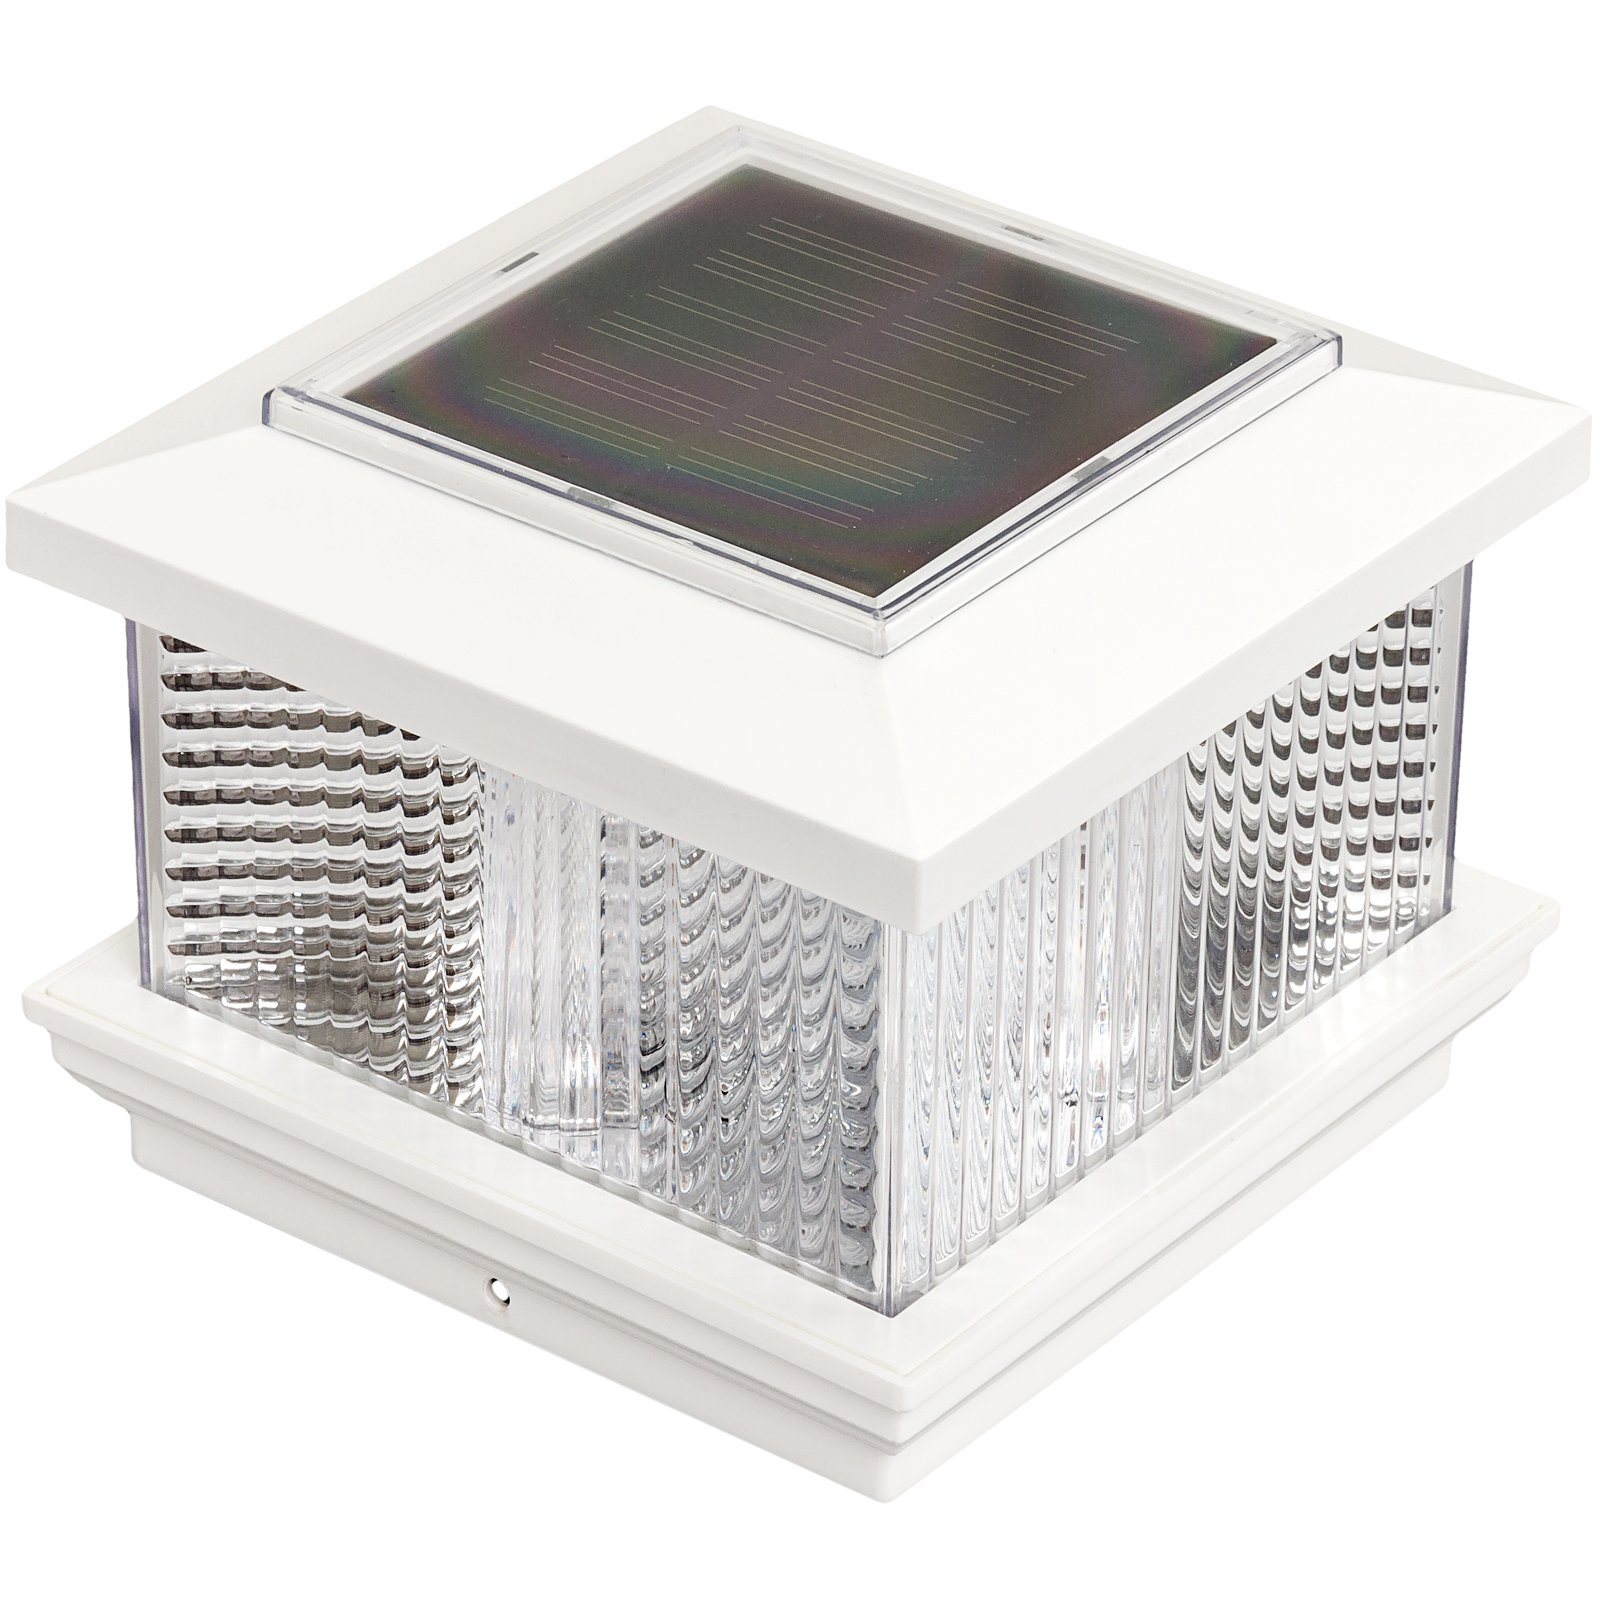 GreenLighting Solar LED Post Cap Light for 4 x 4 Vinyl Posts w/ Wood Post Adapter (White)